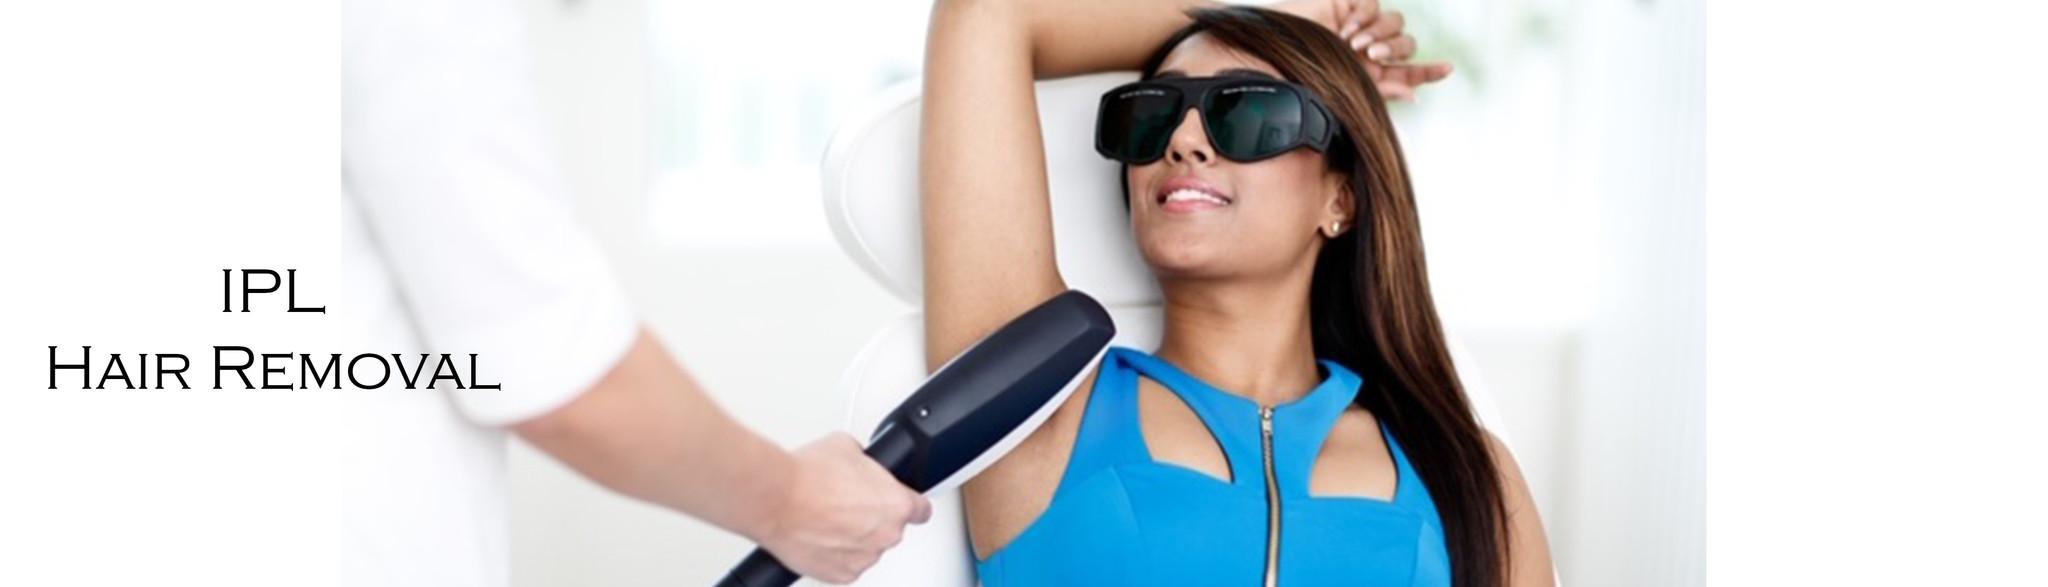 IPL hair removal